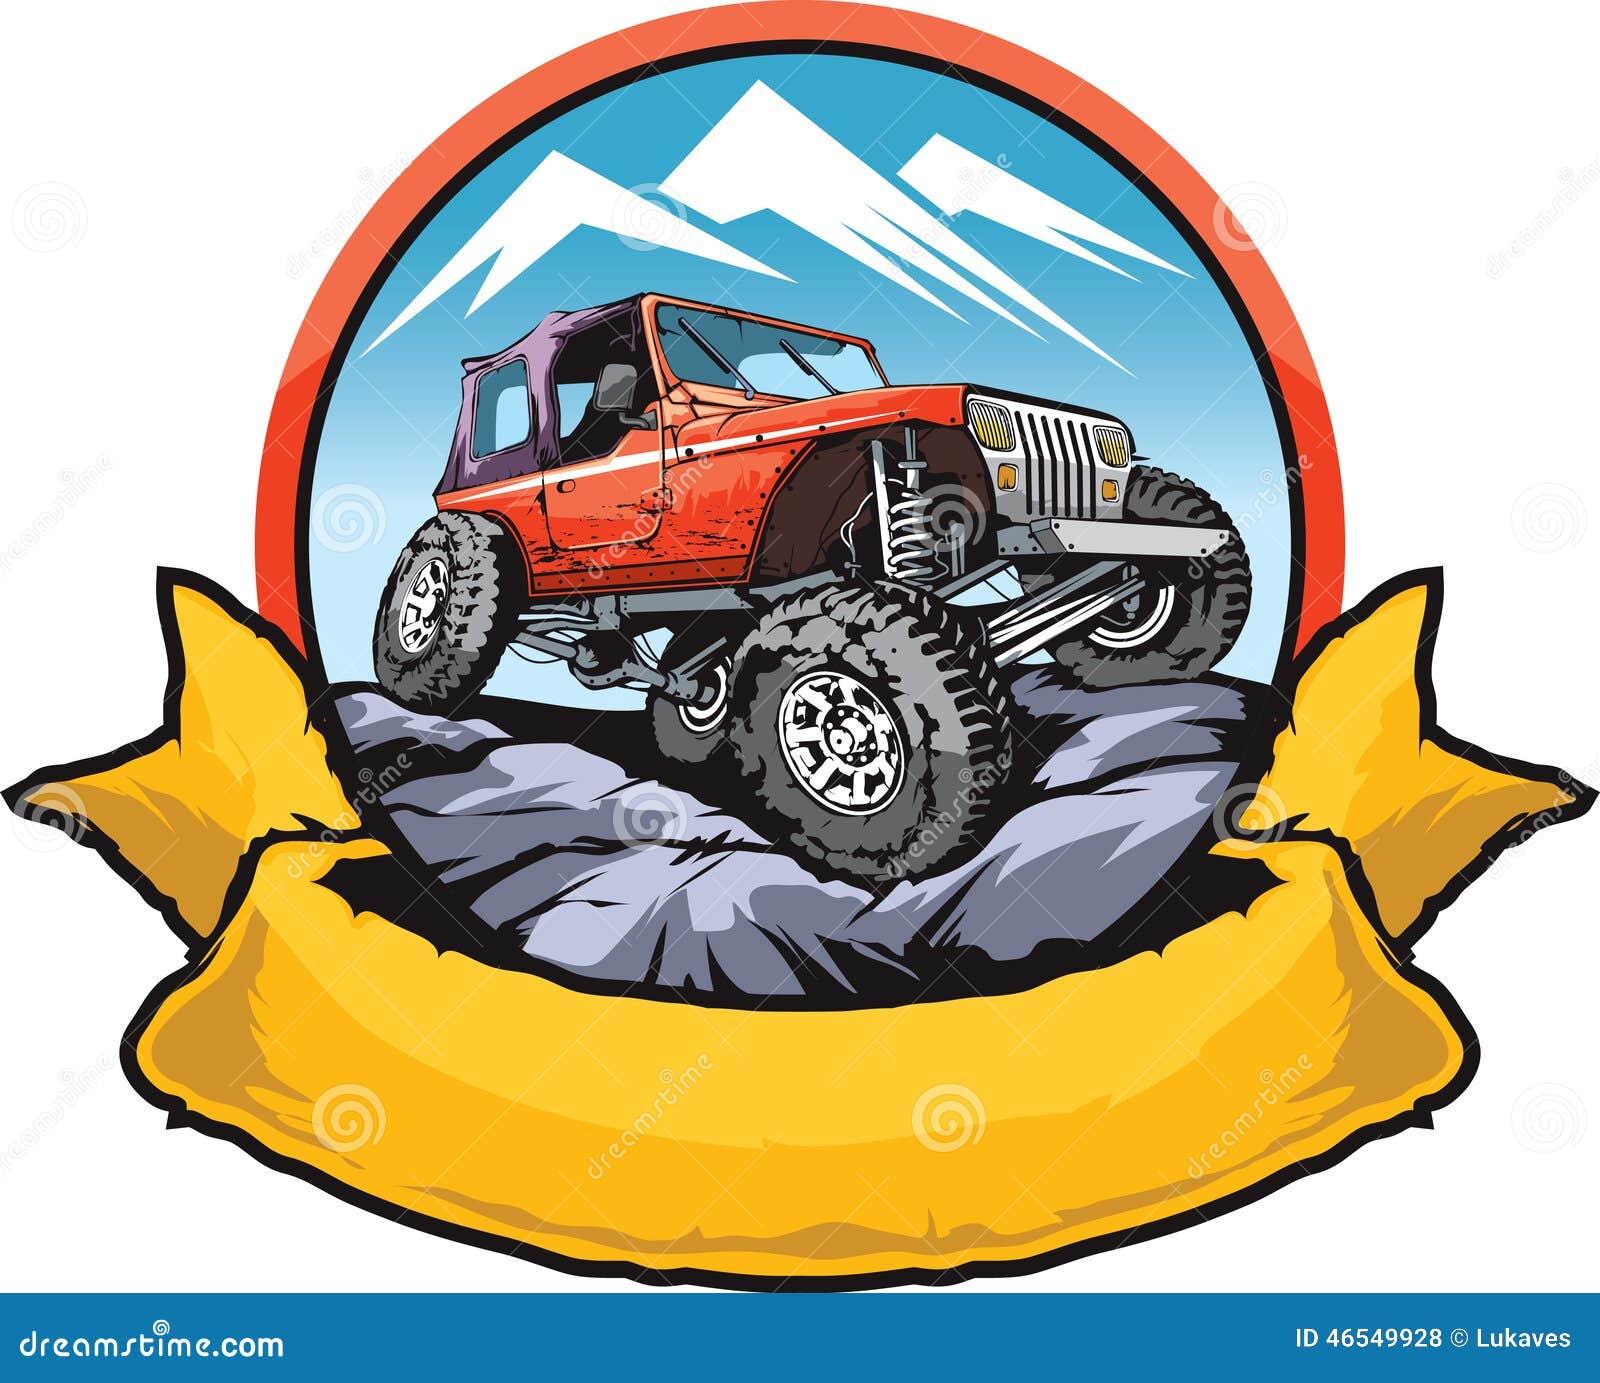 Rock Crawler Art : Rock crawling car stock vector illustration of graphic